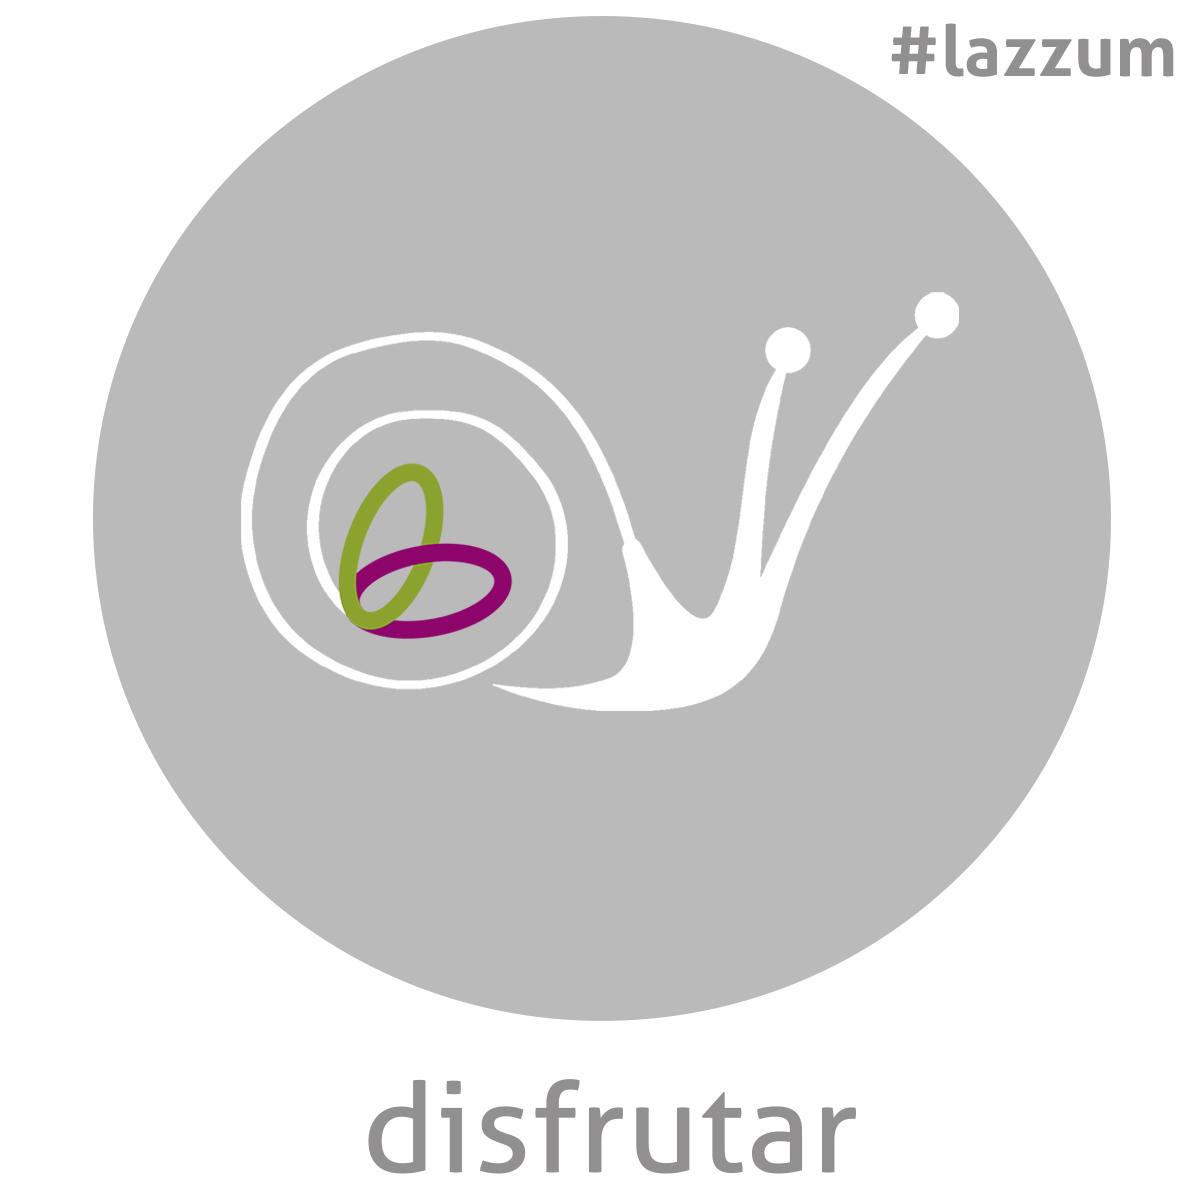 Símbolo_disfrutar&LogoLazzum